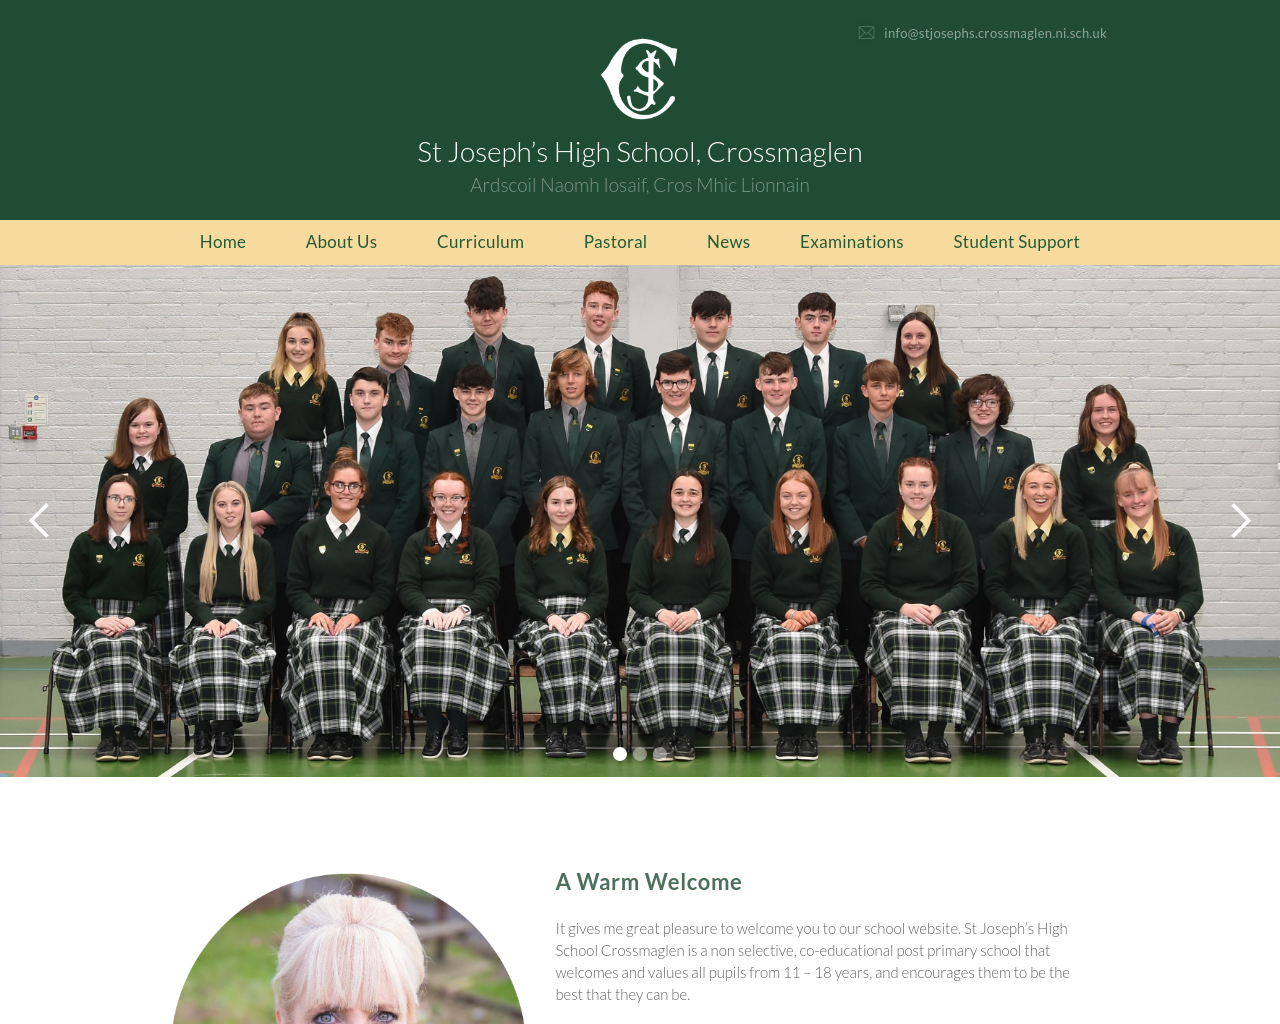 St.Joseph's High School Crossmaglen